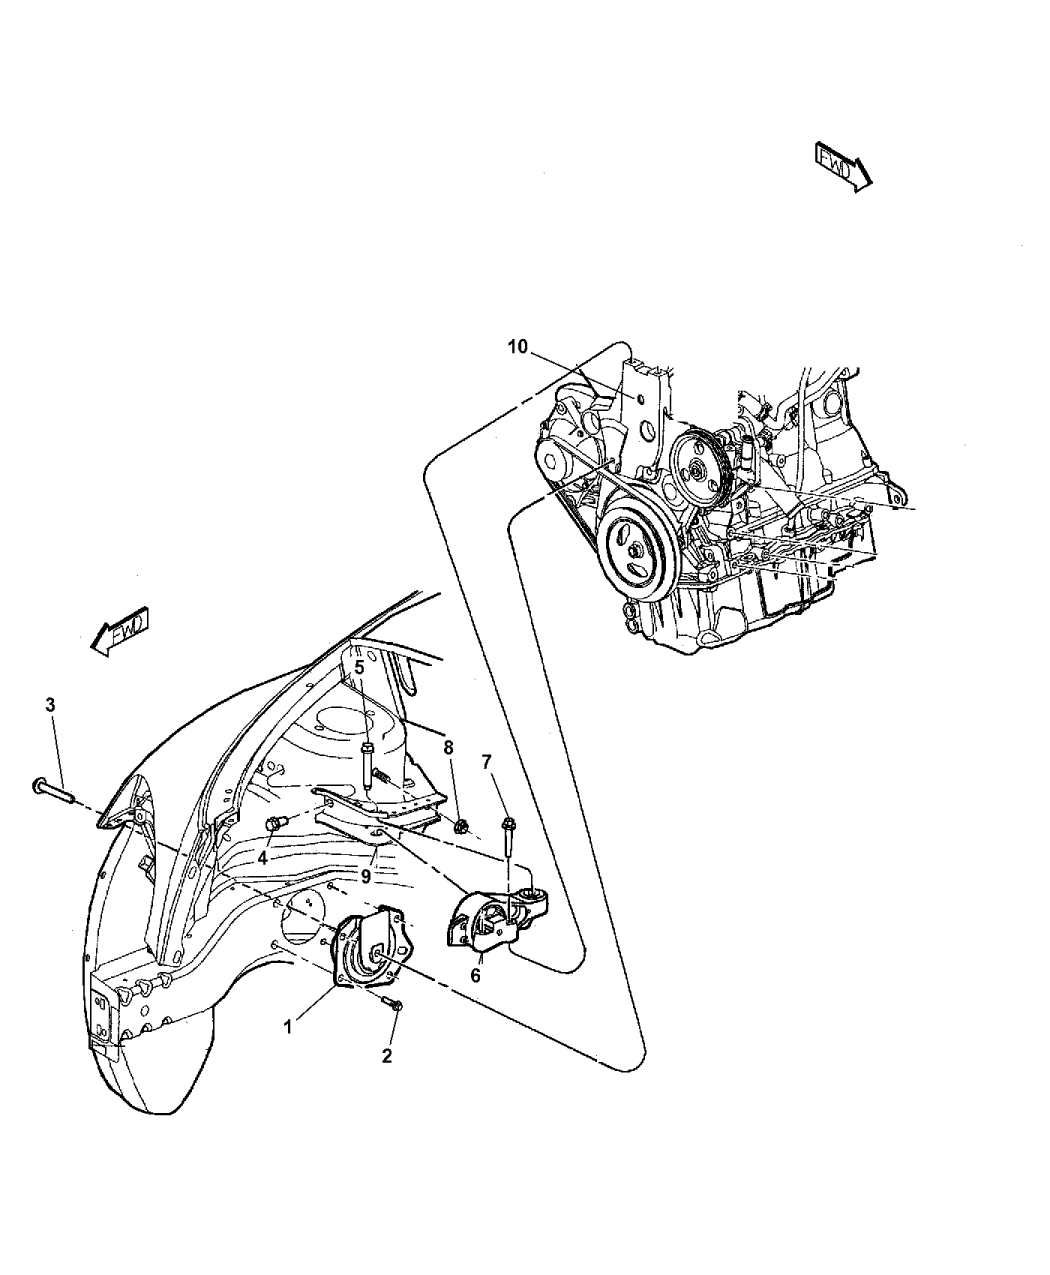 2009 Chrysler Pt Cruiser Engine Mounting Mopar Parts Giant Diagram Thumbnail 8